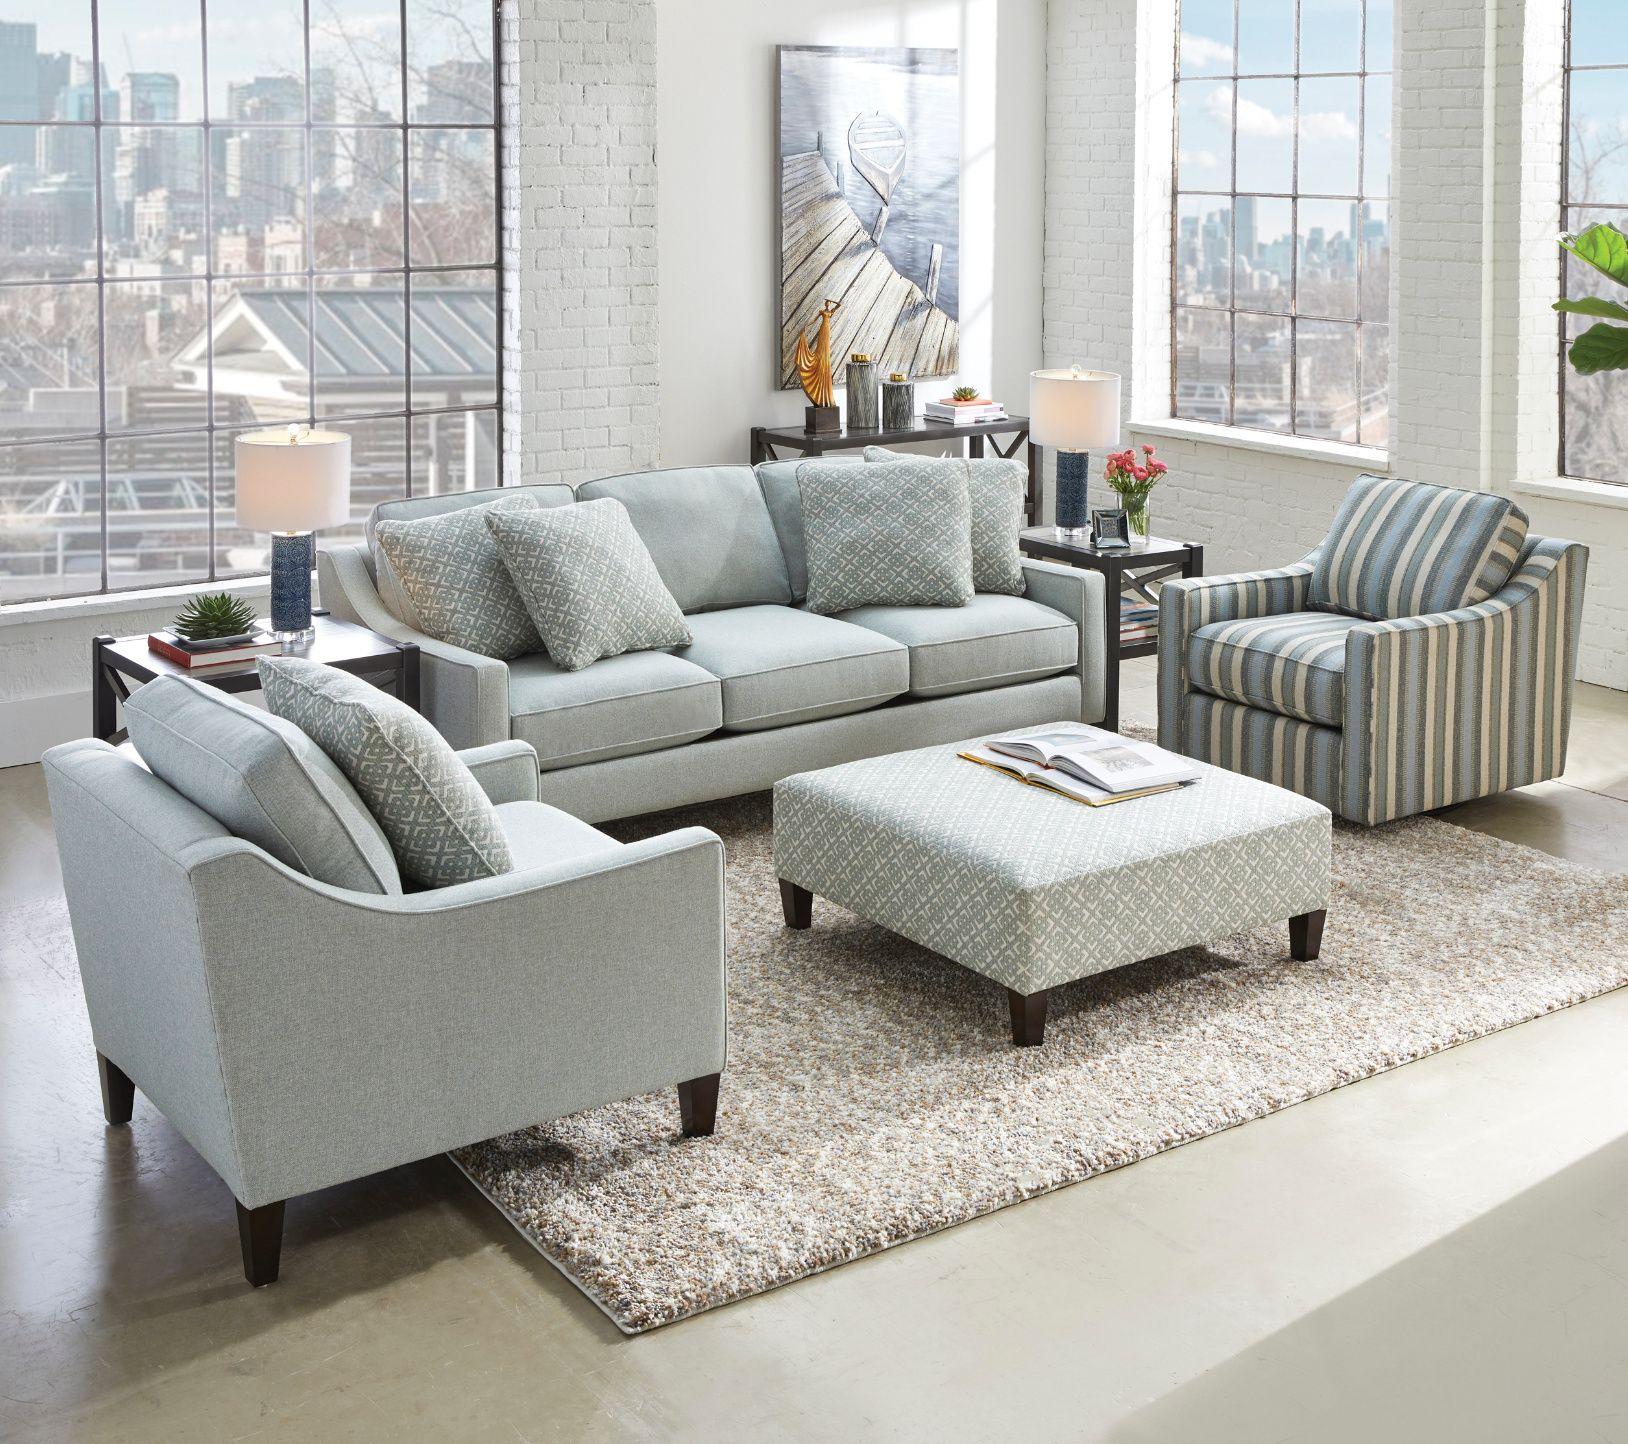 Mcnichols Sofa Living Room Remodel Modern Contemporary Living